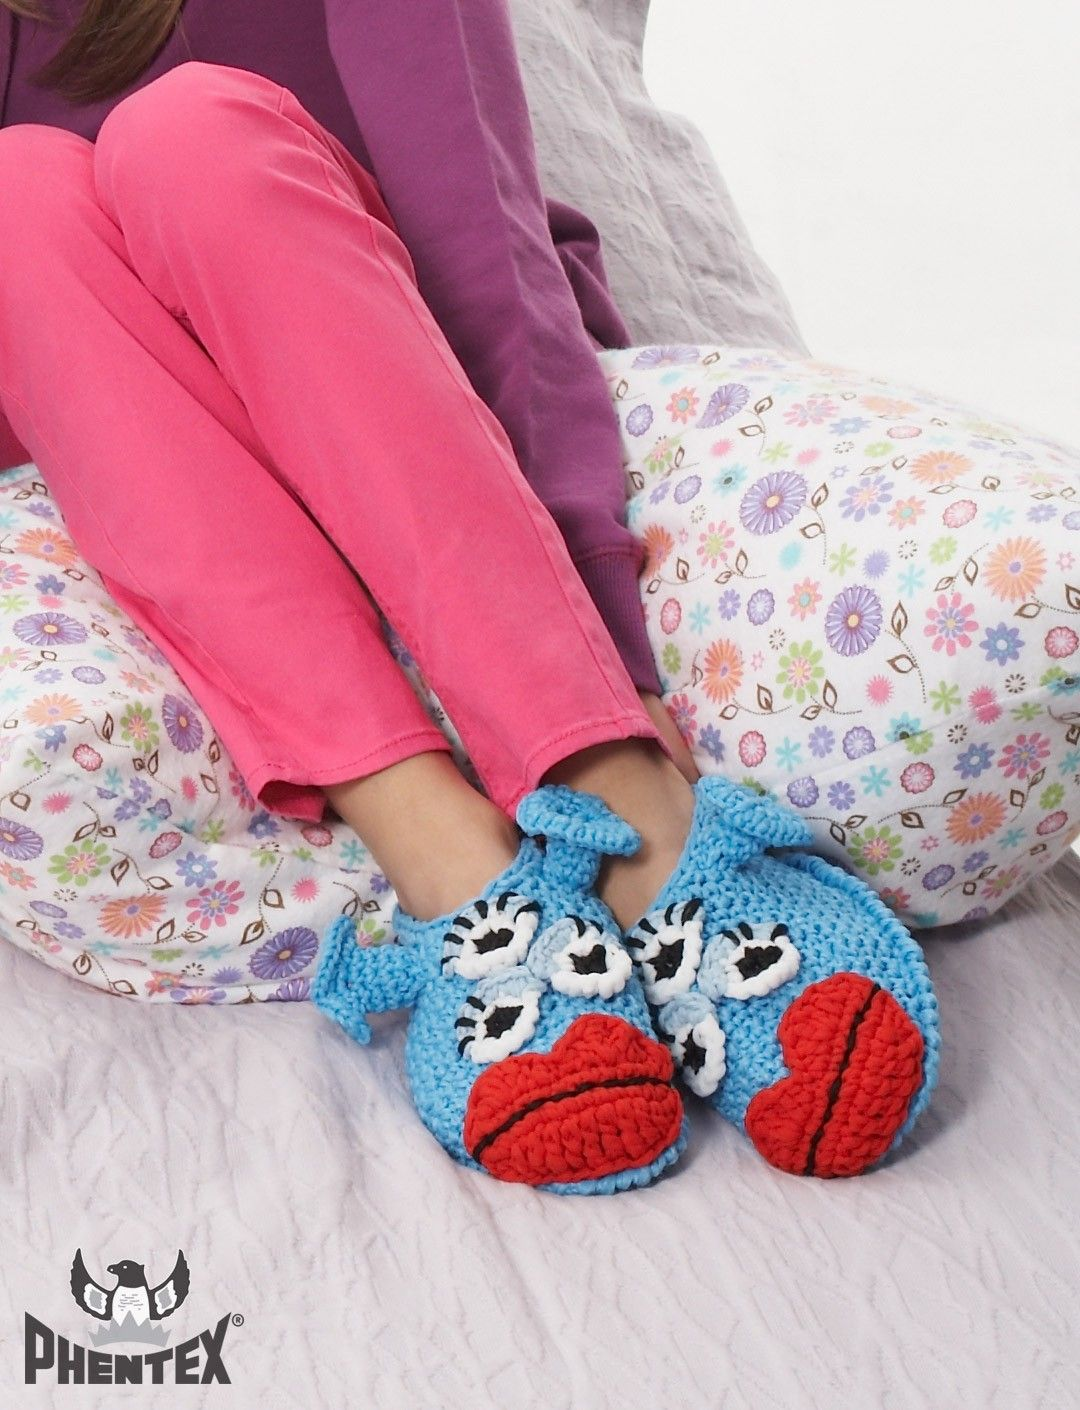 Blue Meanie Monster Slippers - Free Crochet Pattern - (yarnspirations)